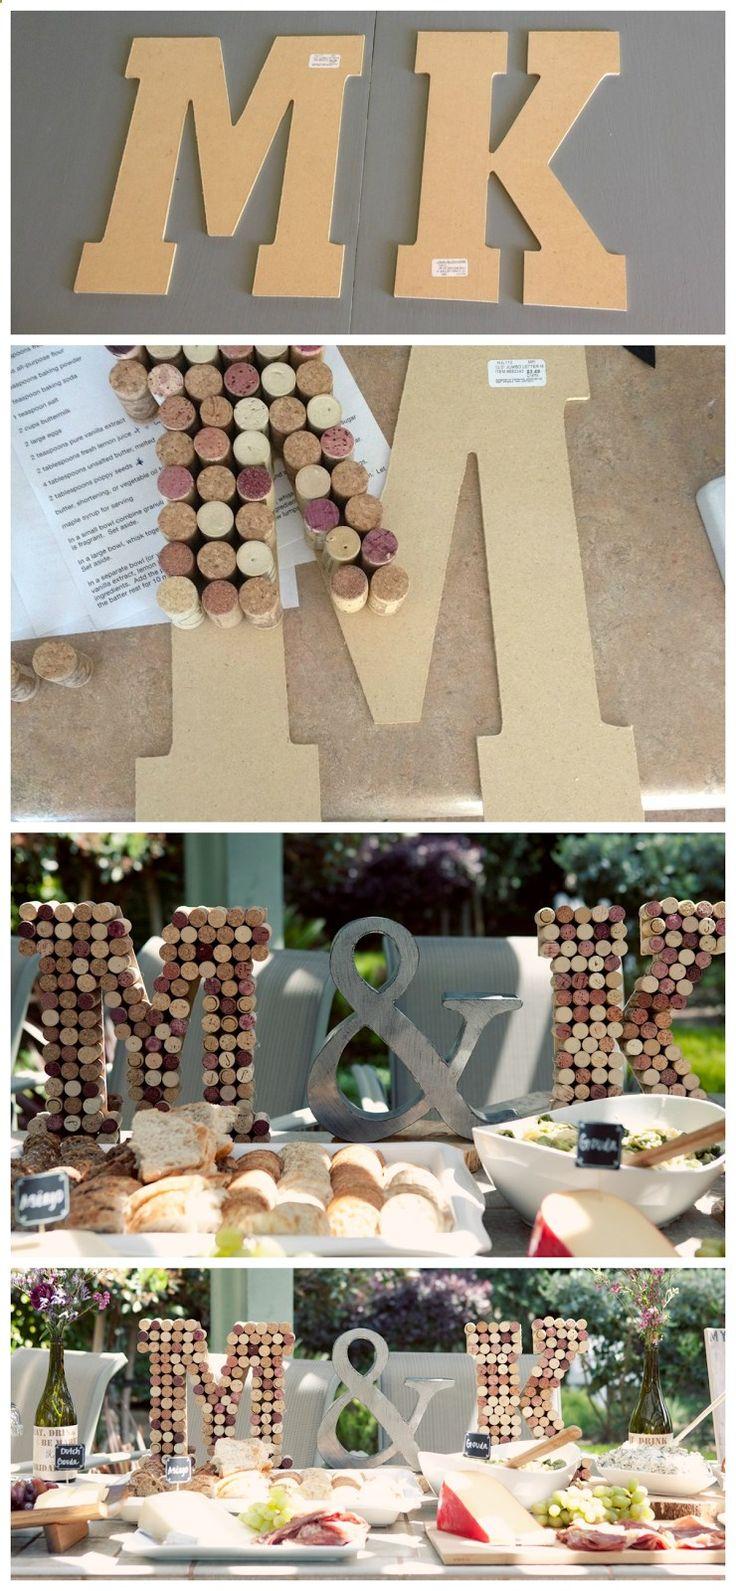 Wine Corks - Cork monogram letters, cork décor, wine themed bridal shower, DIY monogram wine cork letters. #diy #craft #monogram